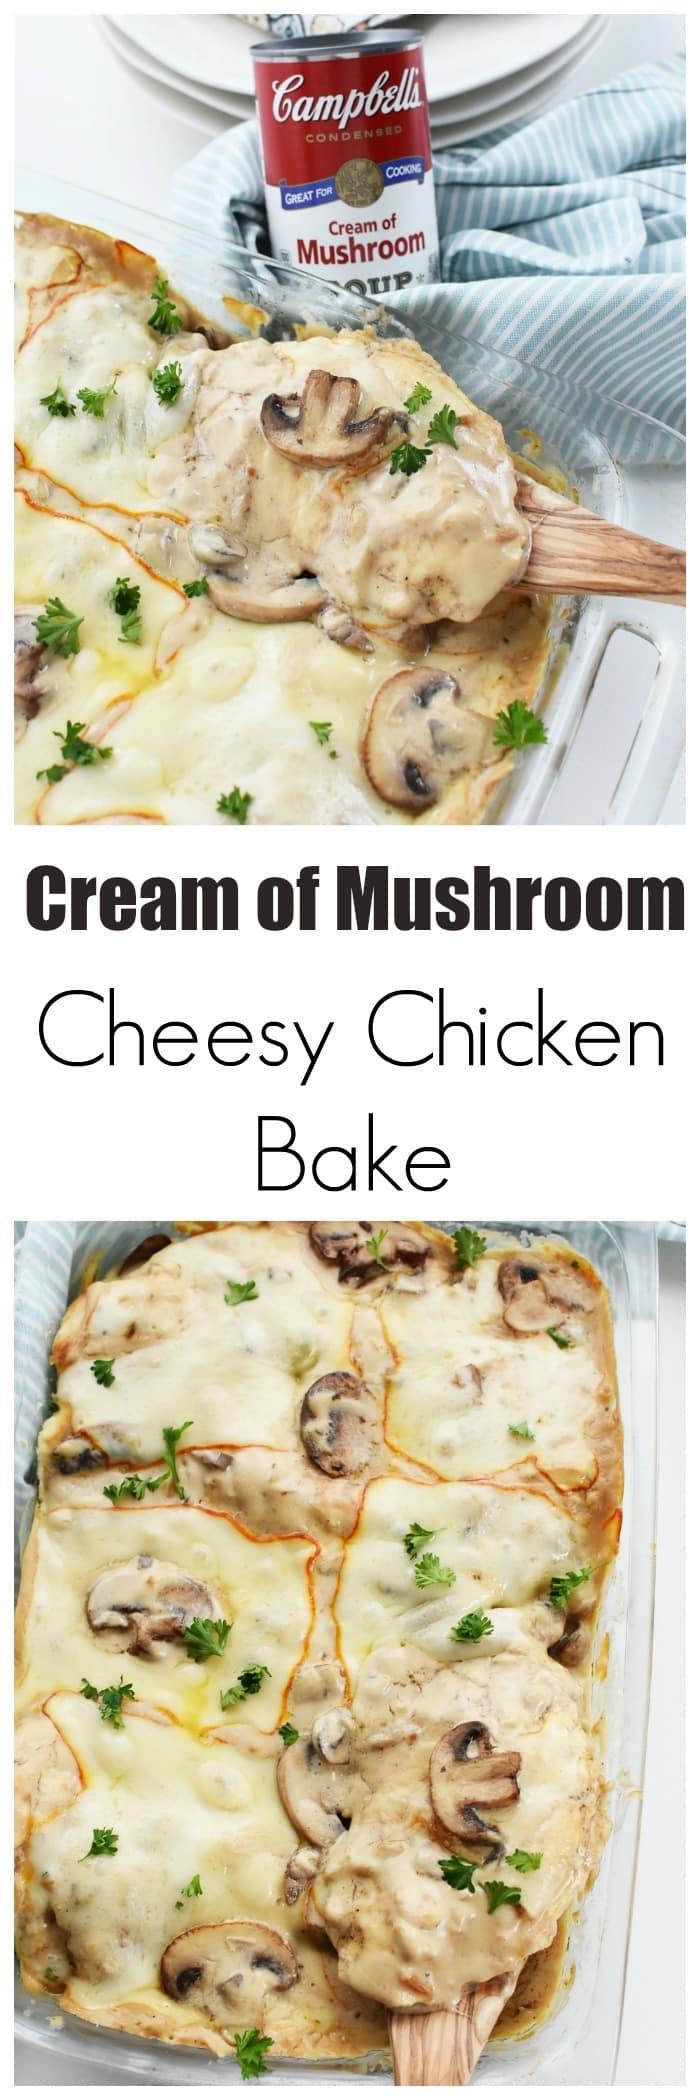 Cream of Mushroom Cheesy Chicken Bake with Sauteed Mushrooms